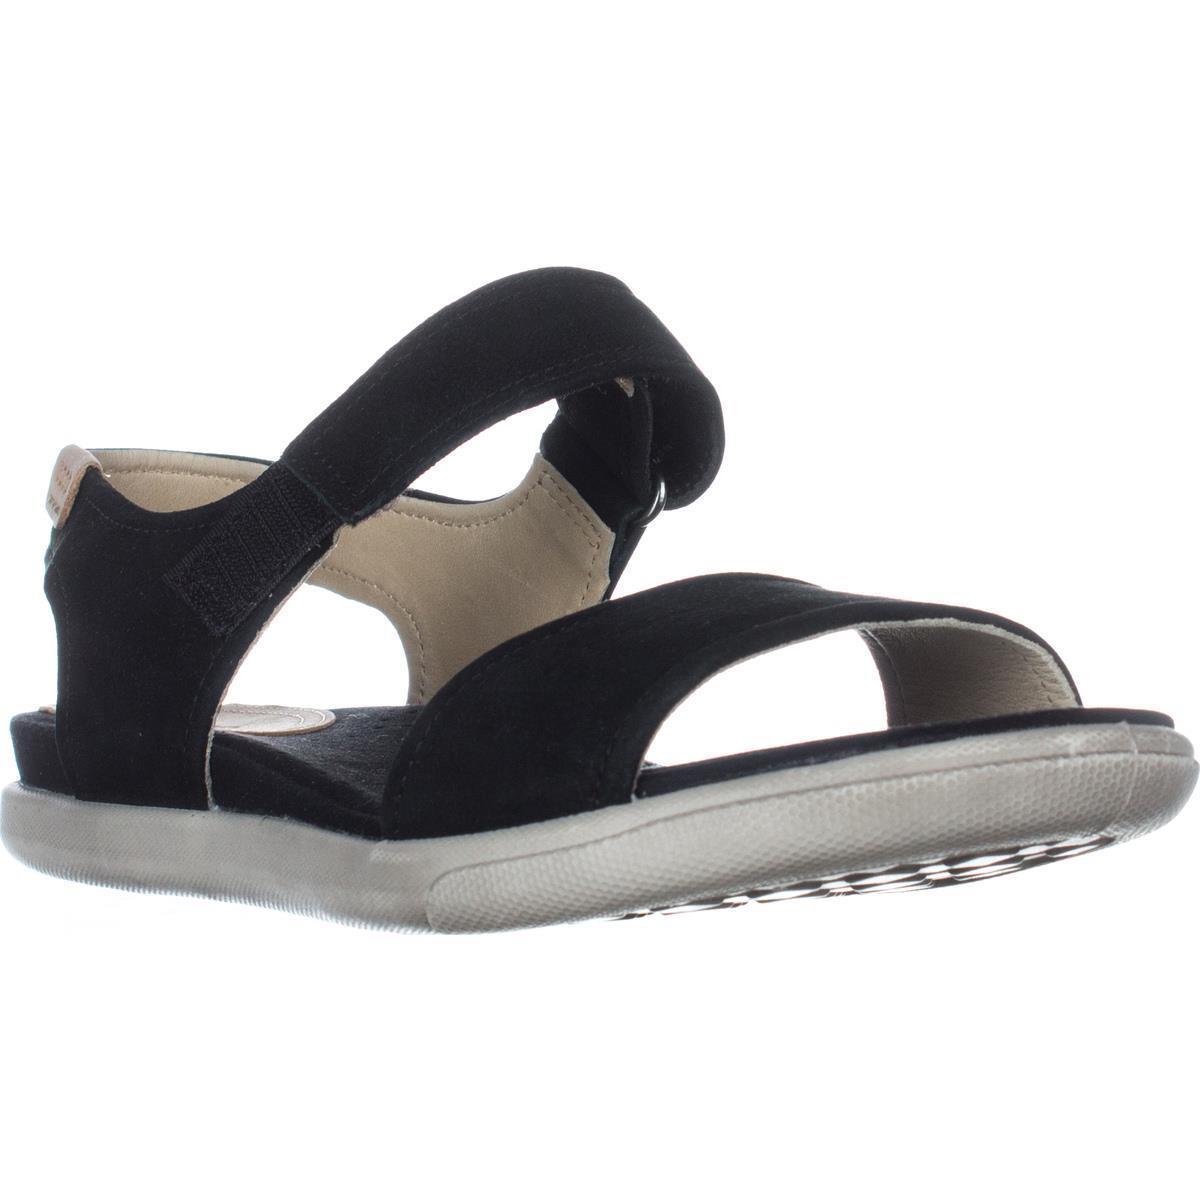 Womens ECCO Damara Flat Comfort Sandals, Black by Ecco